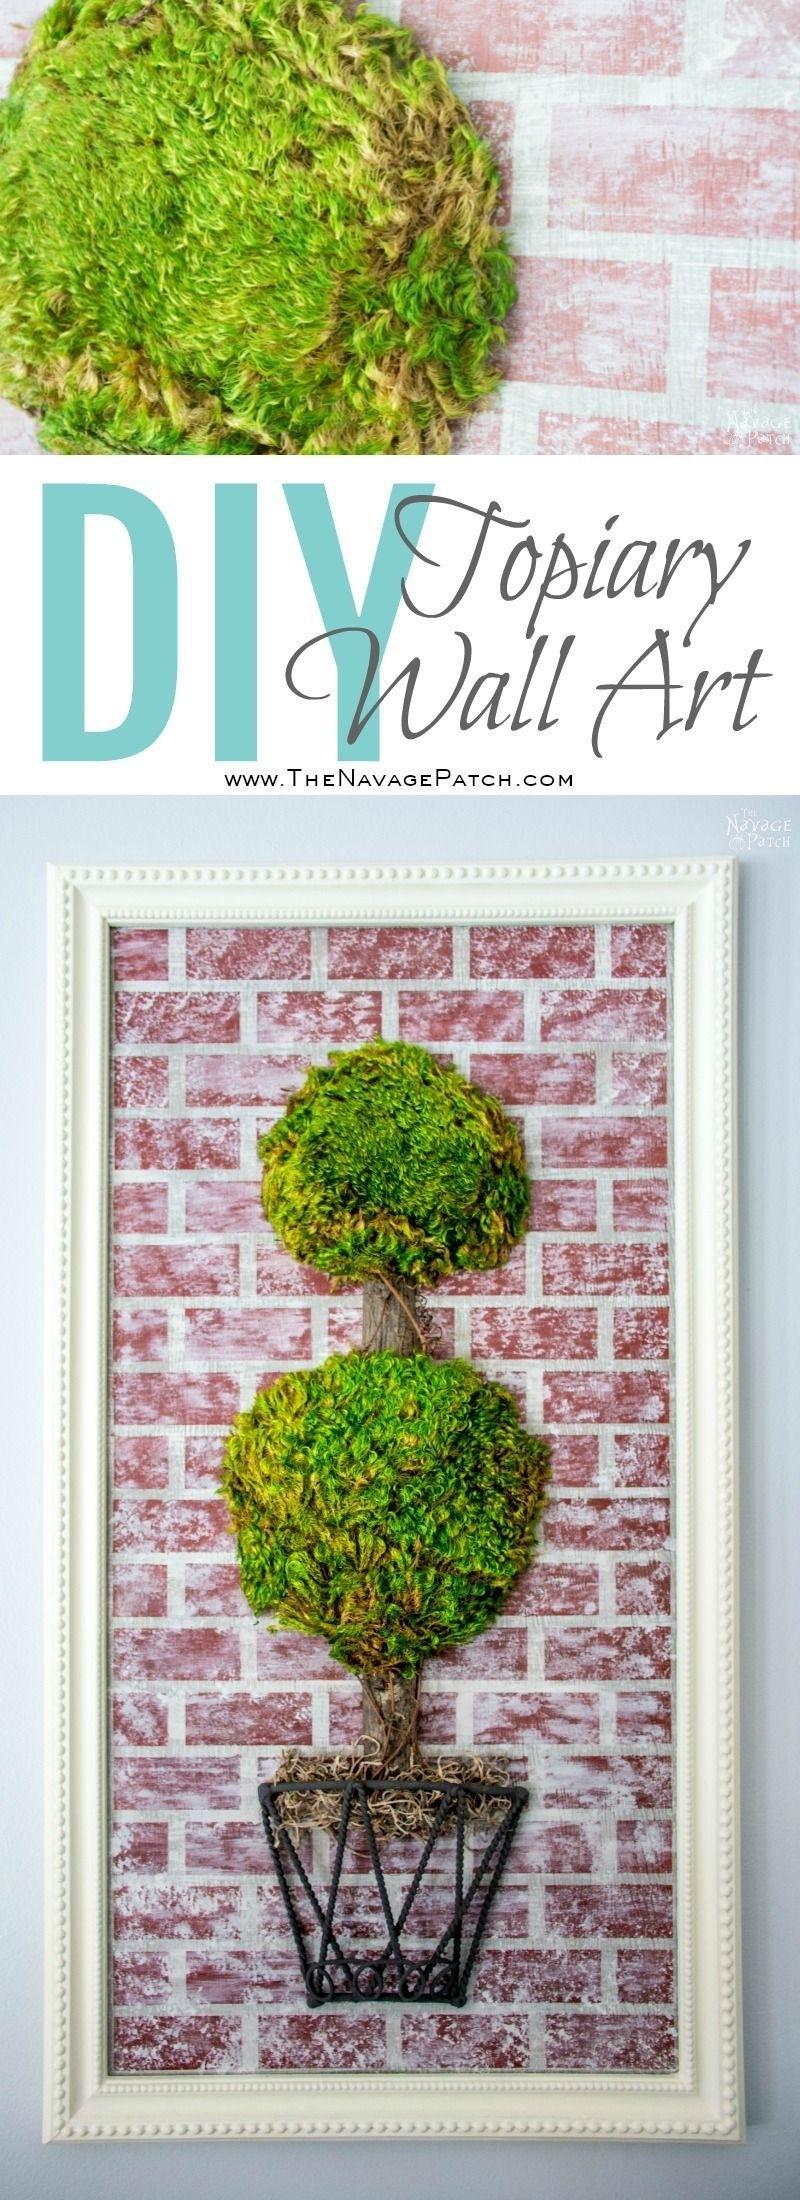 Topiary Wall Art | Joss & Main Wall Decor Knock Off | Diy Moss Pertaining To 2018 Joss And Main Wall Art (View 18 of 20)